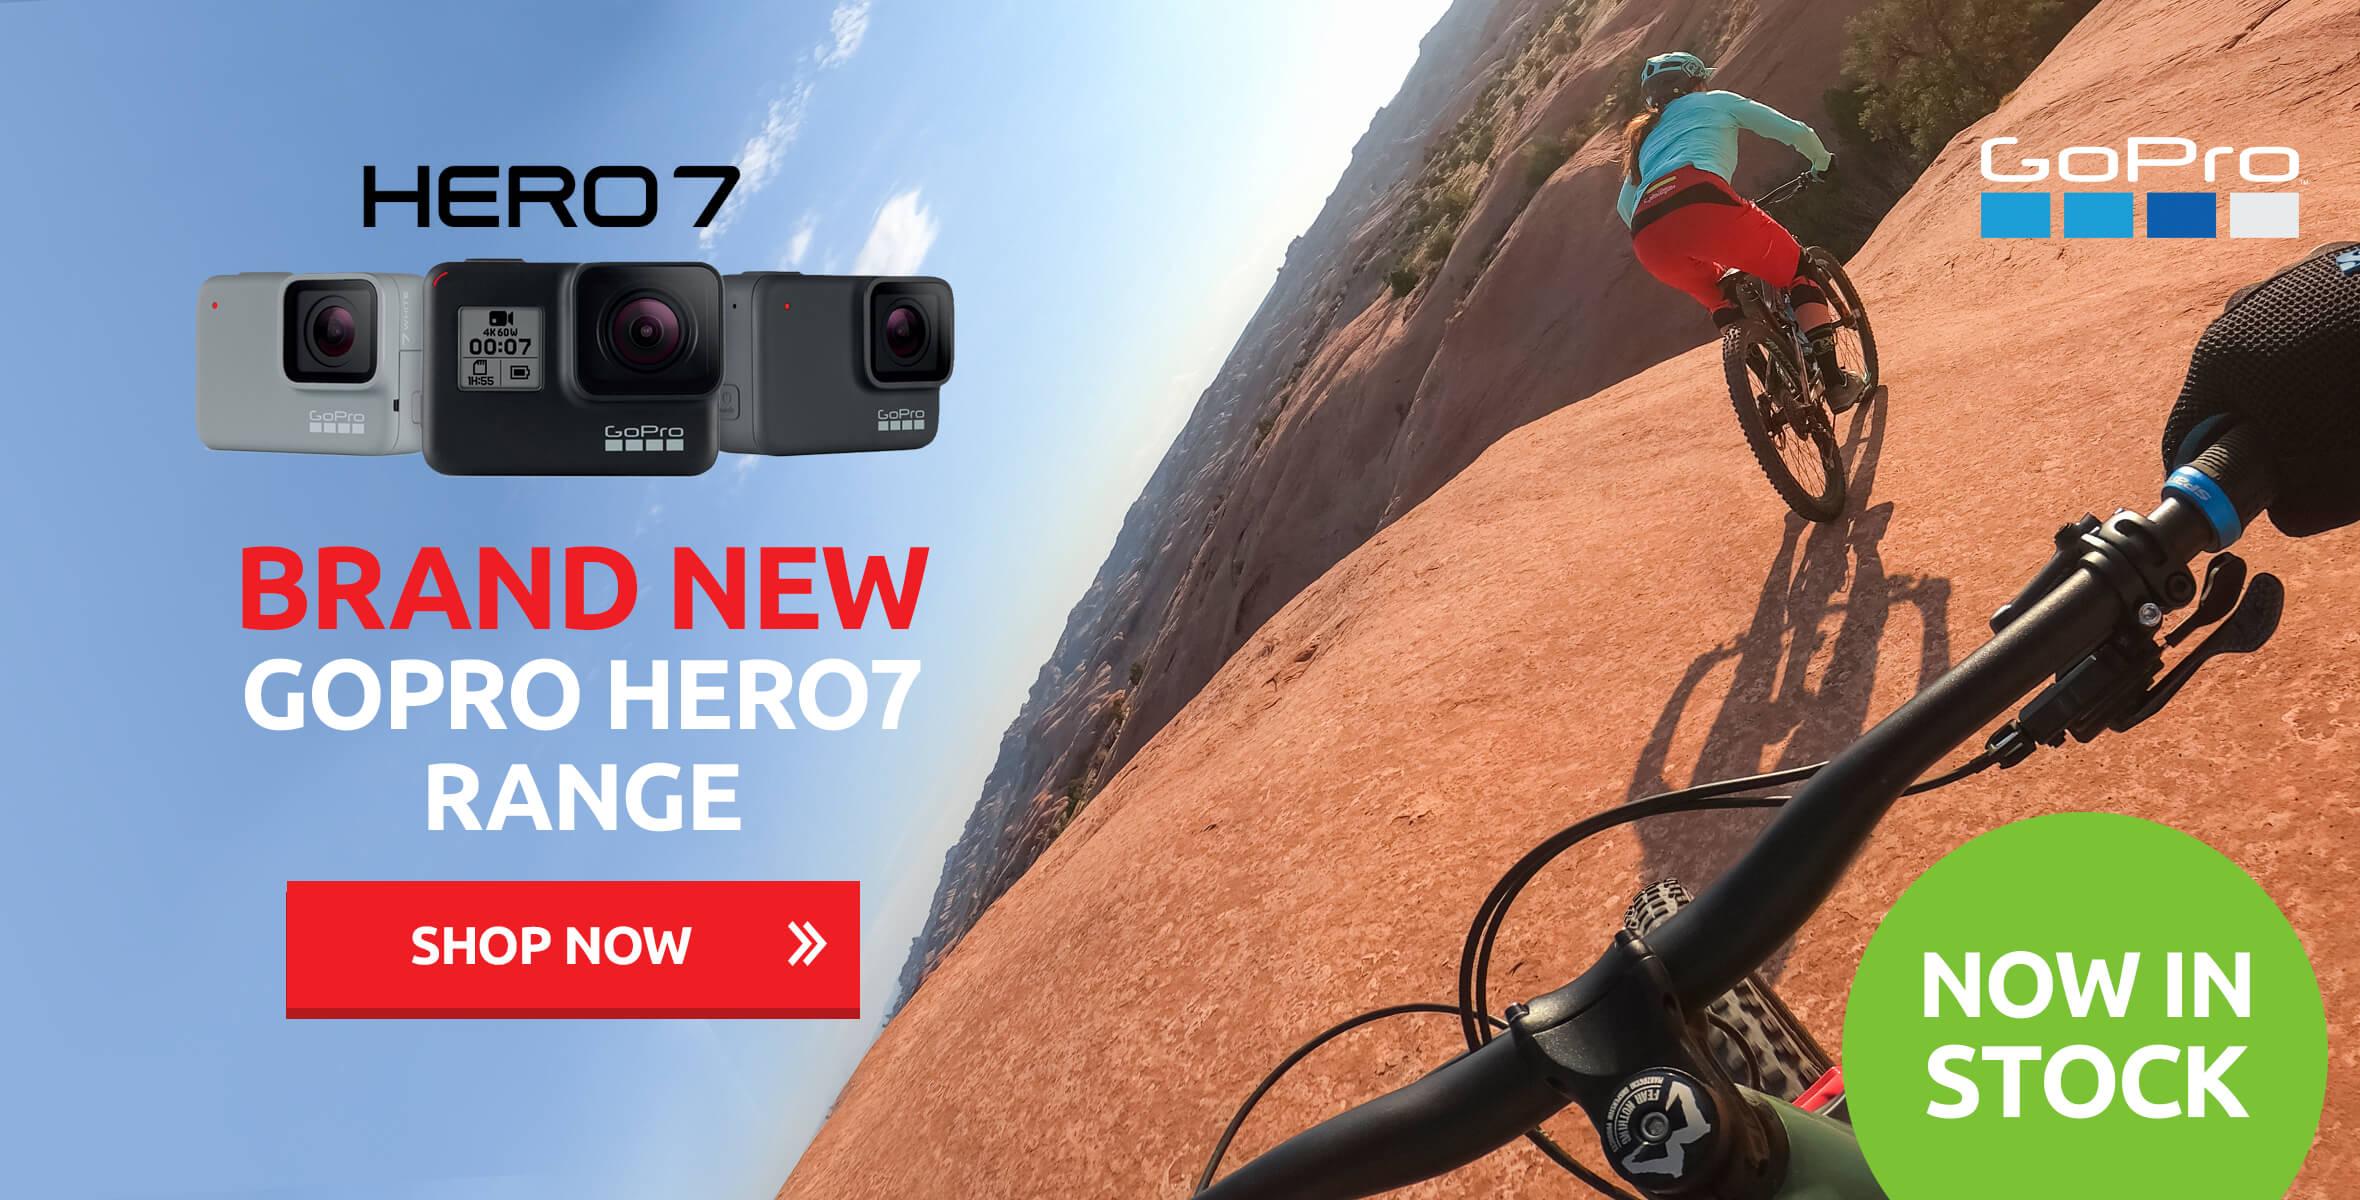 GoPro Hero7 Range